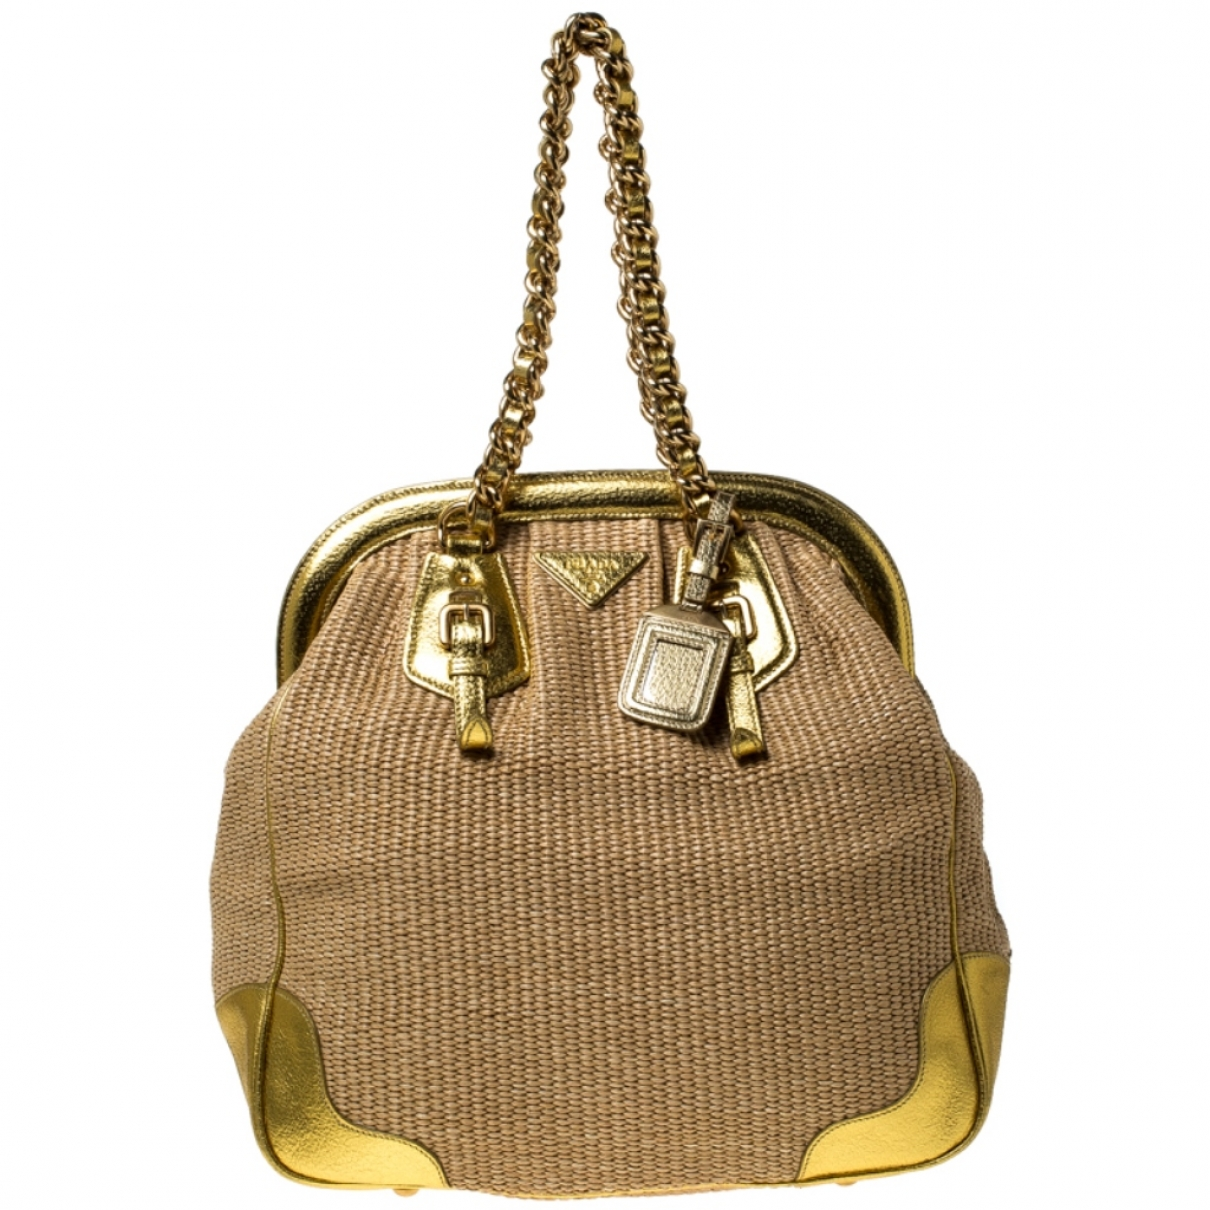 Prada \N Gold Cloth handbag for Women \N